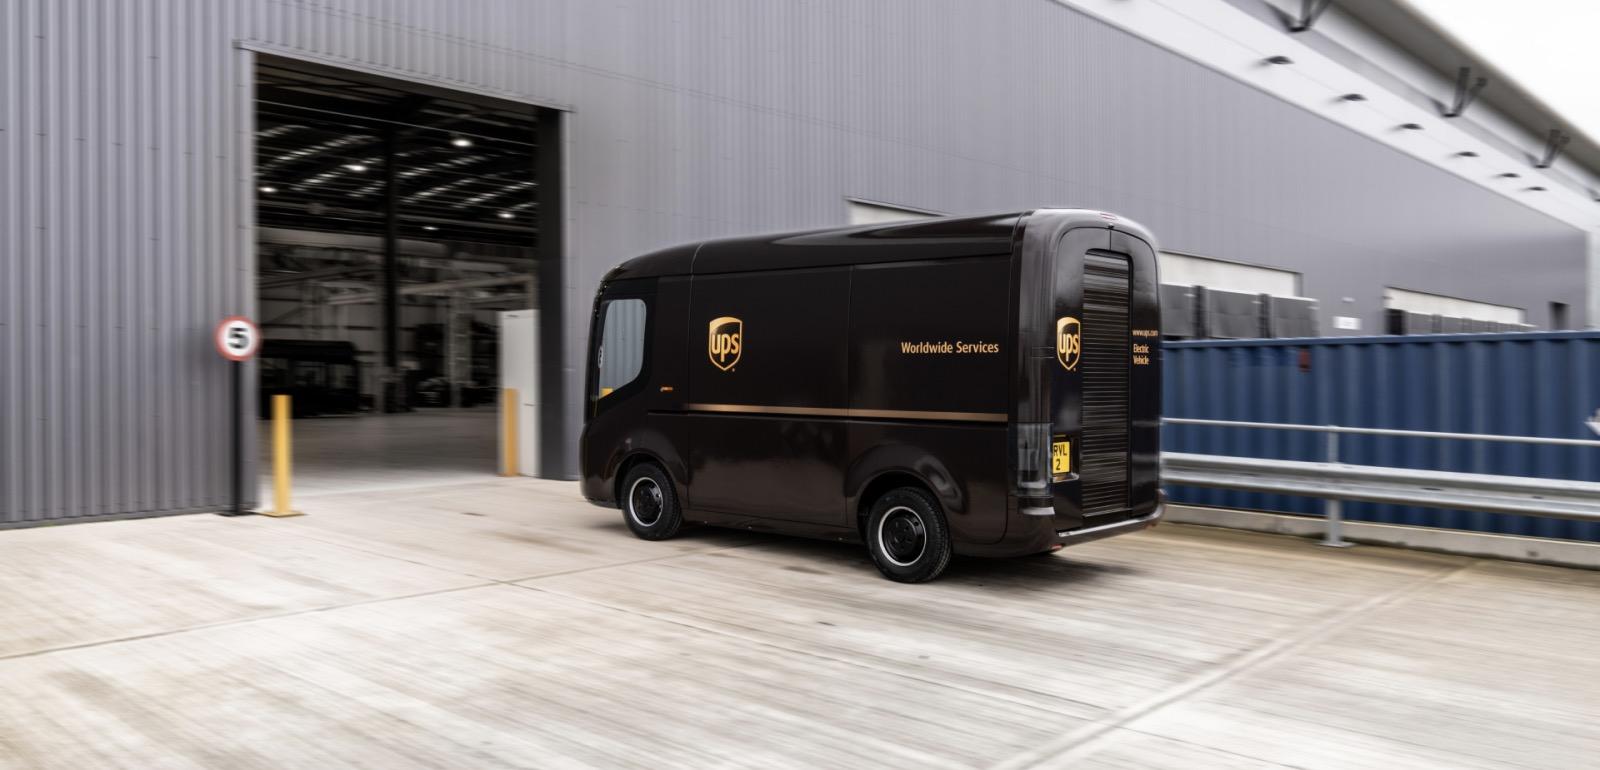 Arrival van - UPS